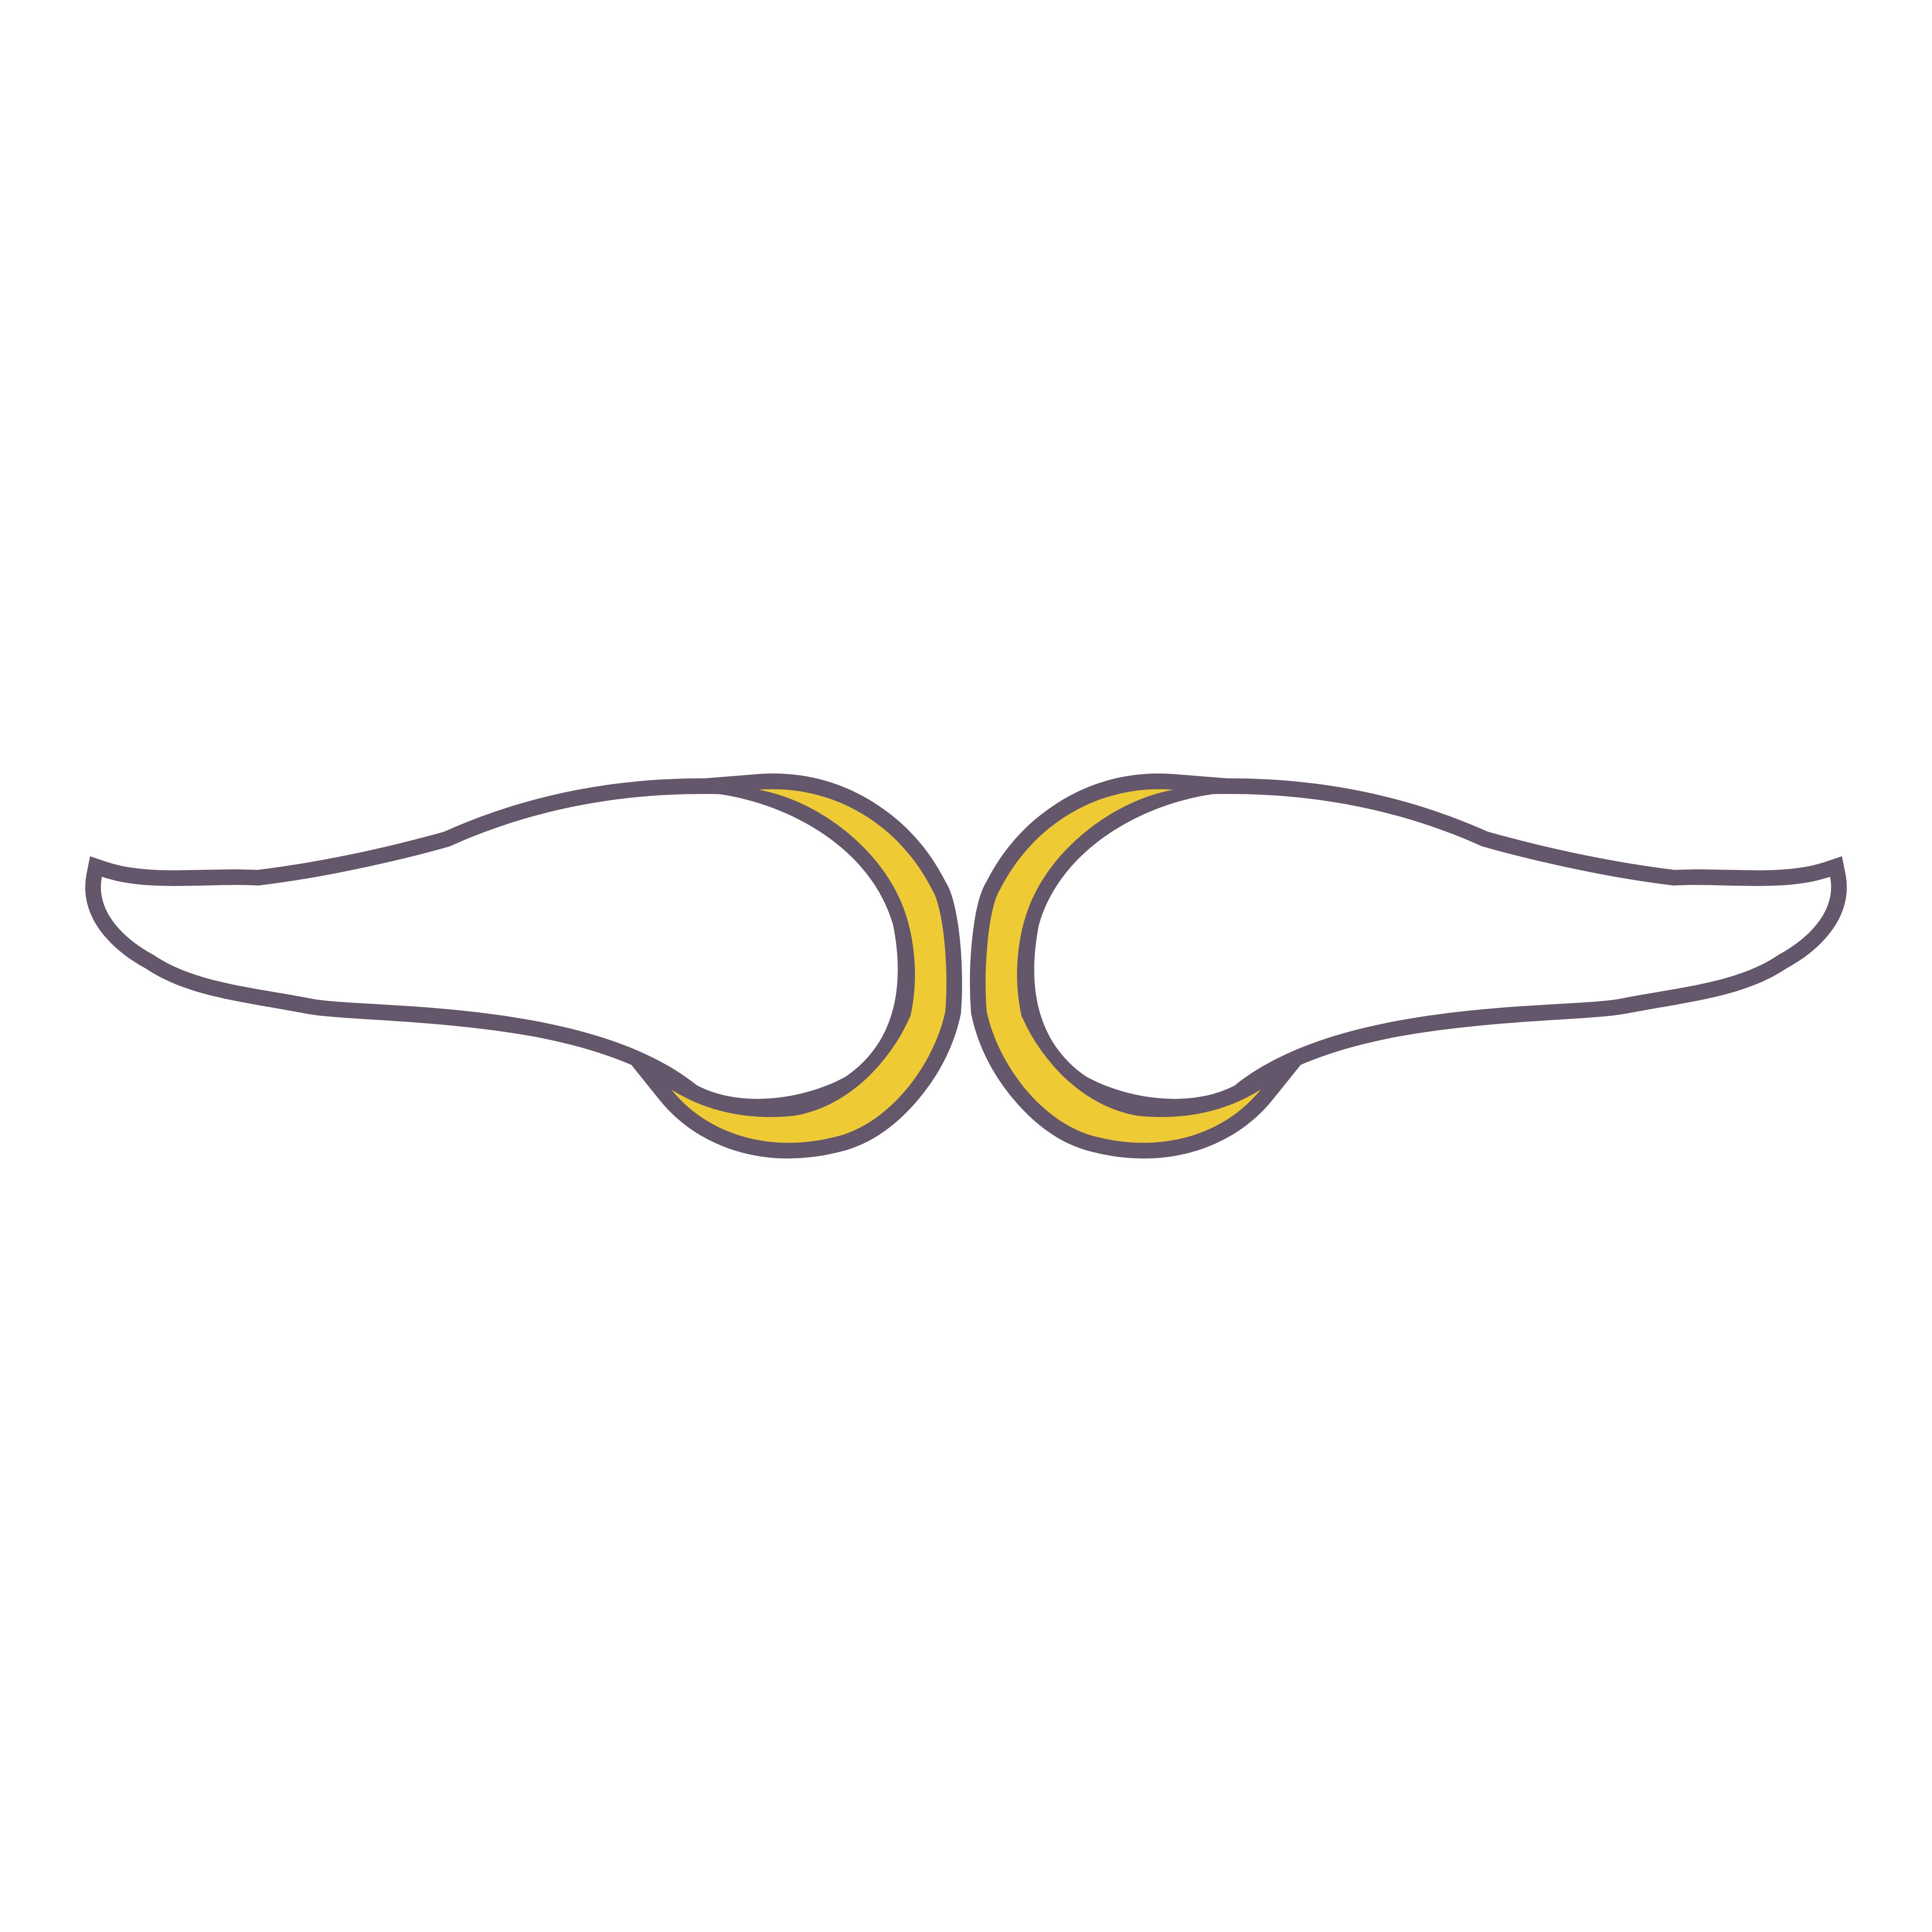 Minnesota Vikings – Logos Download